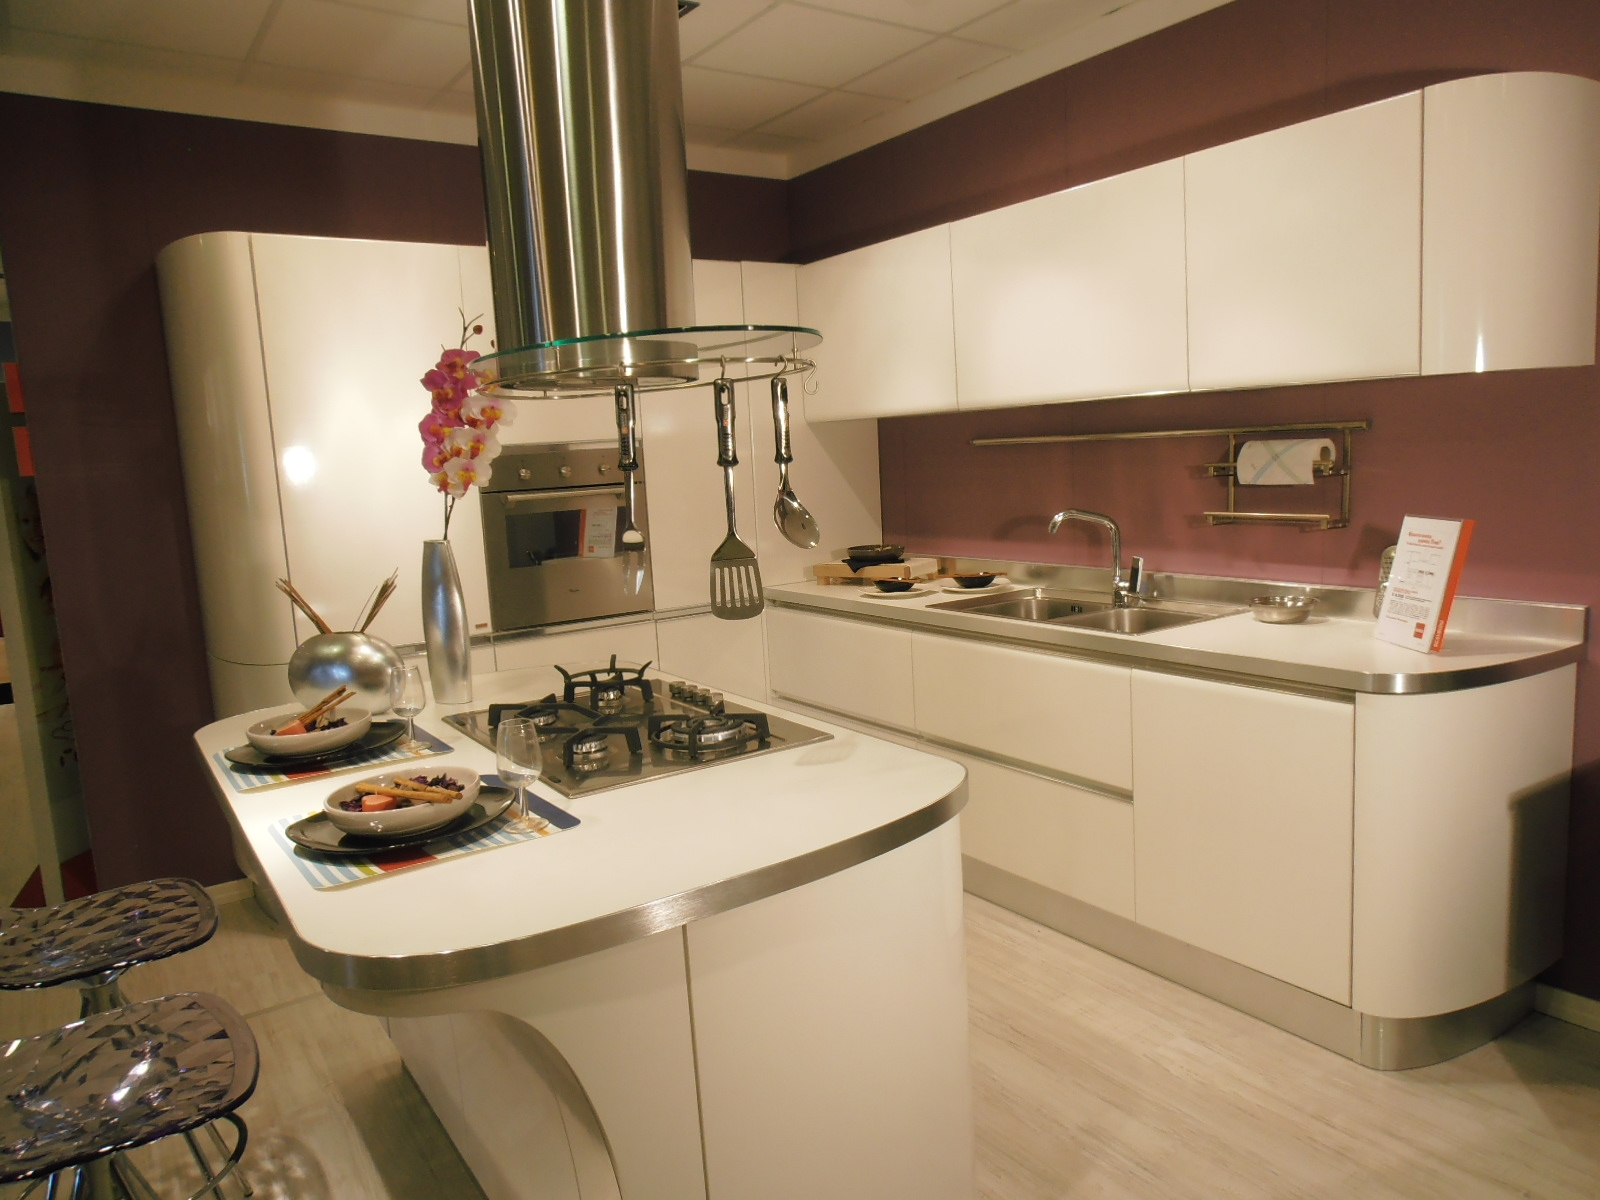 Cucina scavolini tess moderna cucine a prezzi scontati - Scavolini prezzi cucine ...